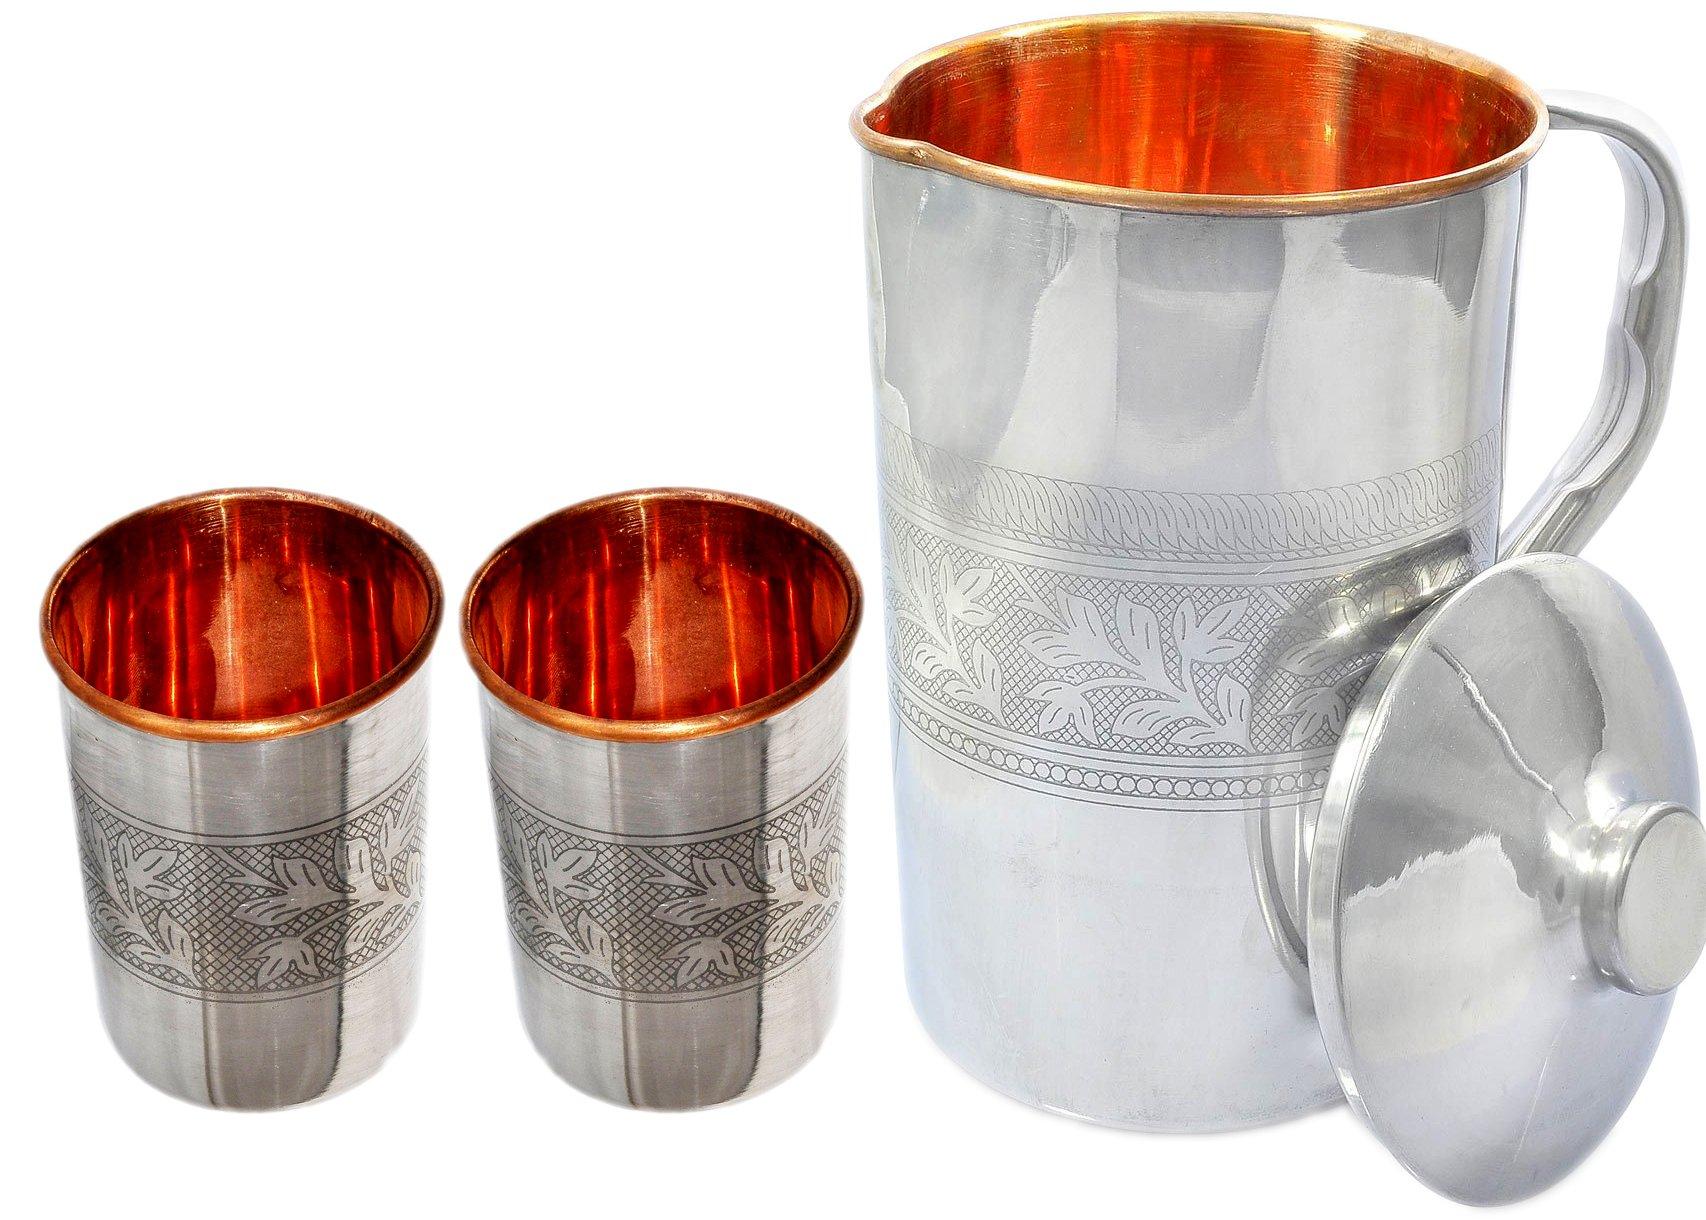 PARIJAT HANDICRAFT Outside Steel Inside Copper Water Pitcher Jug Set 2 Water Glasses Cup Tumbler Jug Capacity 54 Ounce Glass Capacity 10 Ounce Steel Copper Embossed